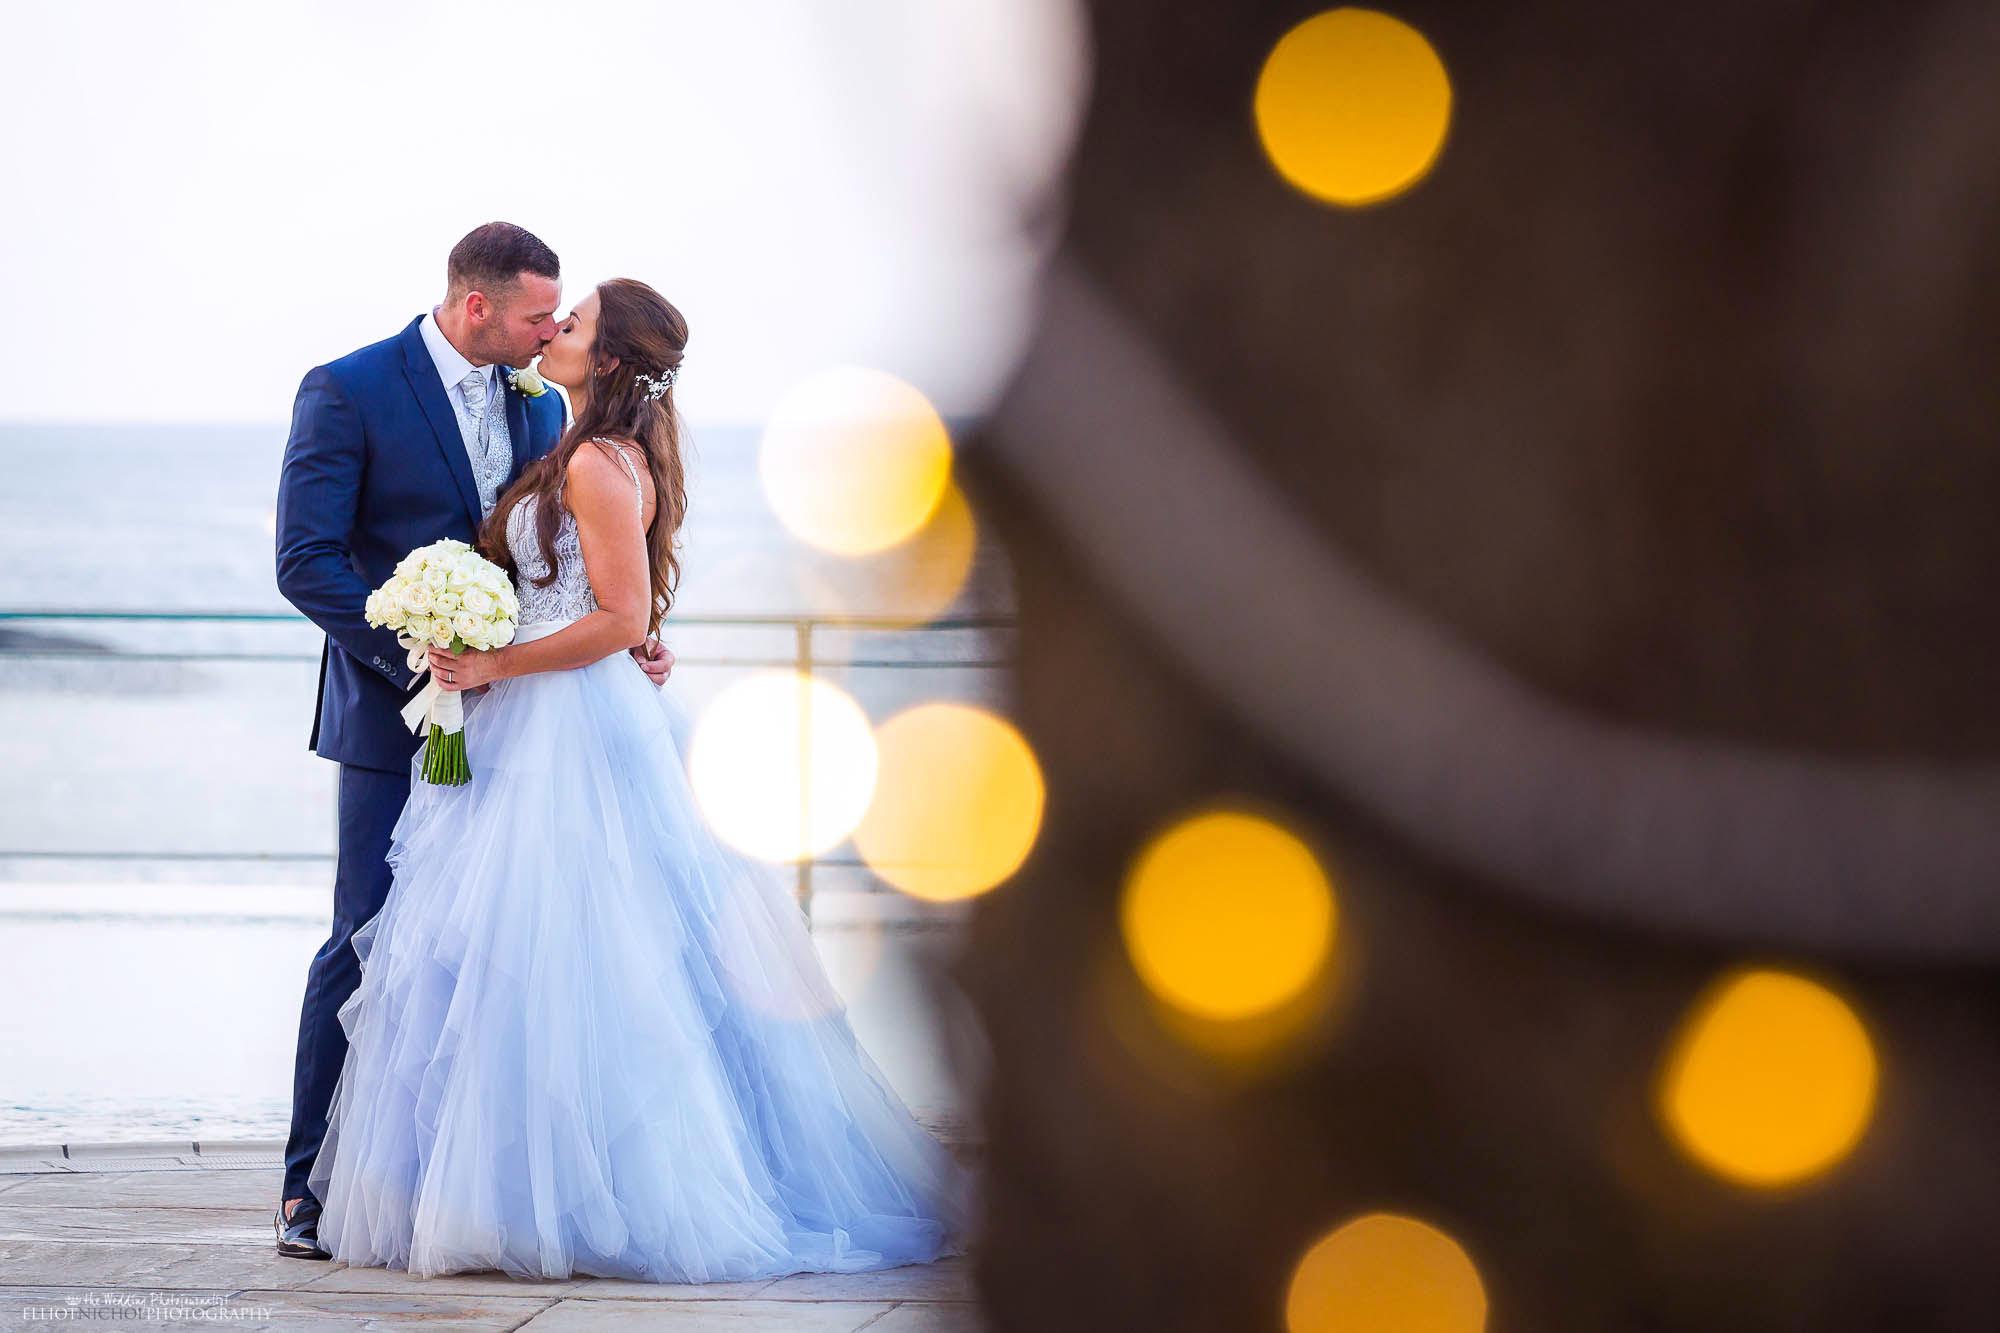 Bride in her blue wedding dress kissing her groom. Wedding photography by Newcastle based photographer Elliot Nichol.